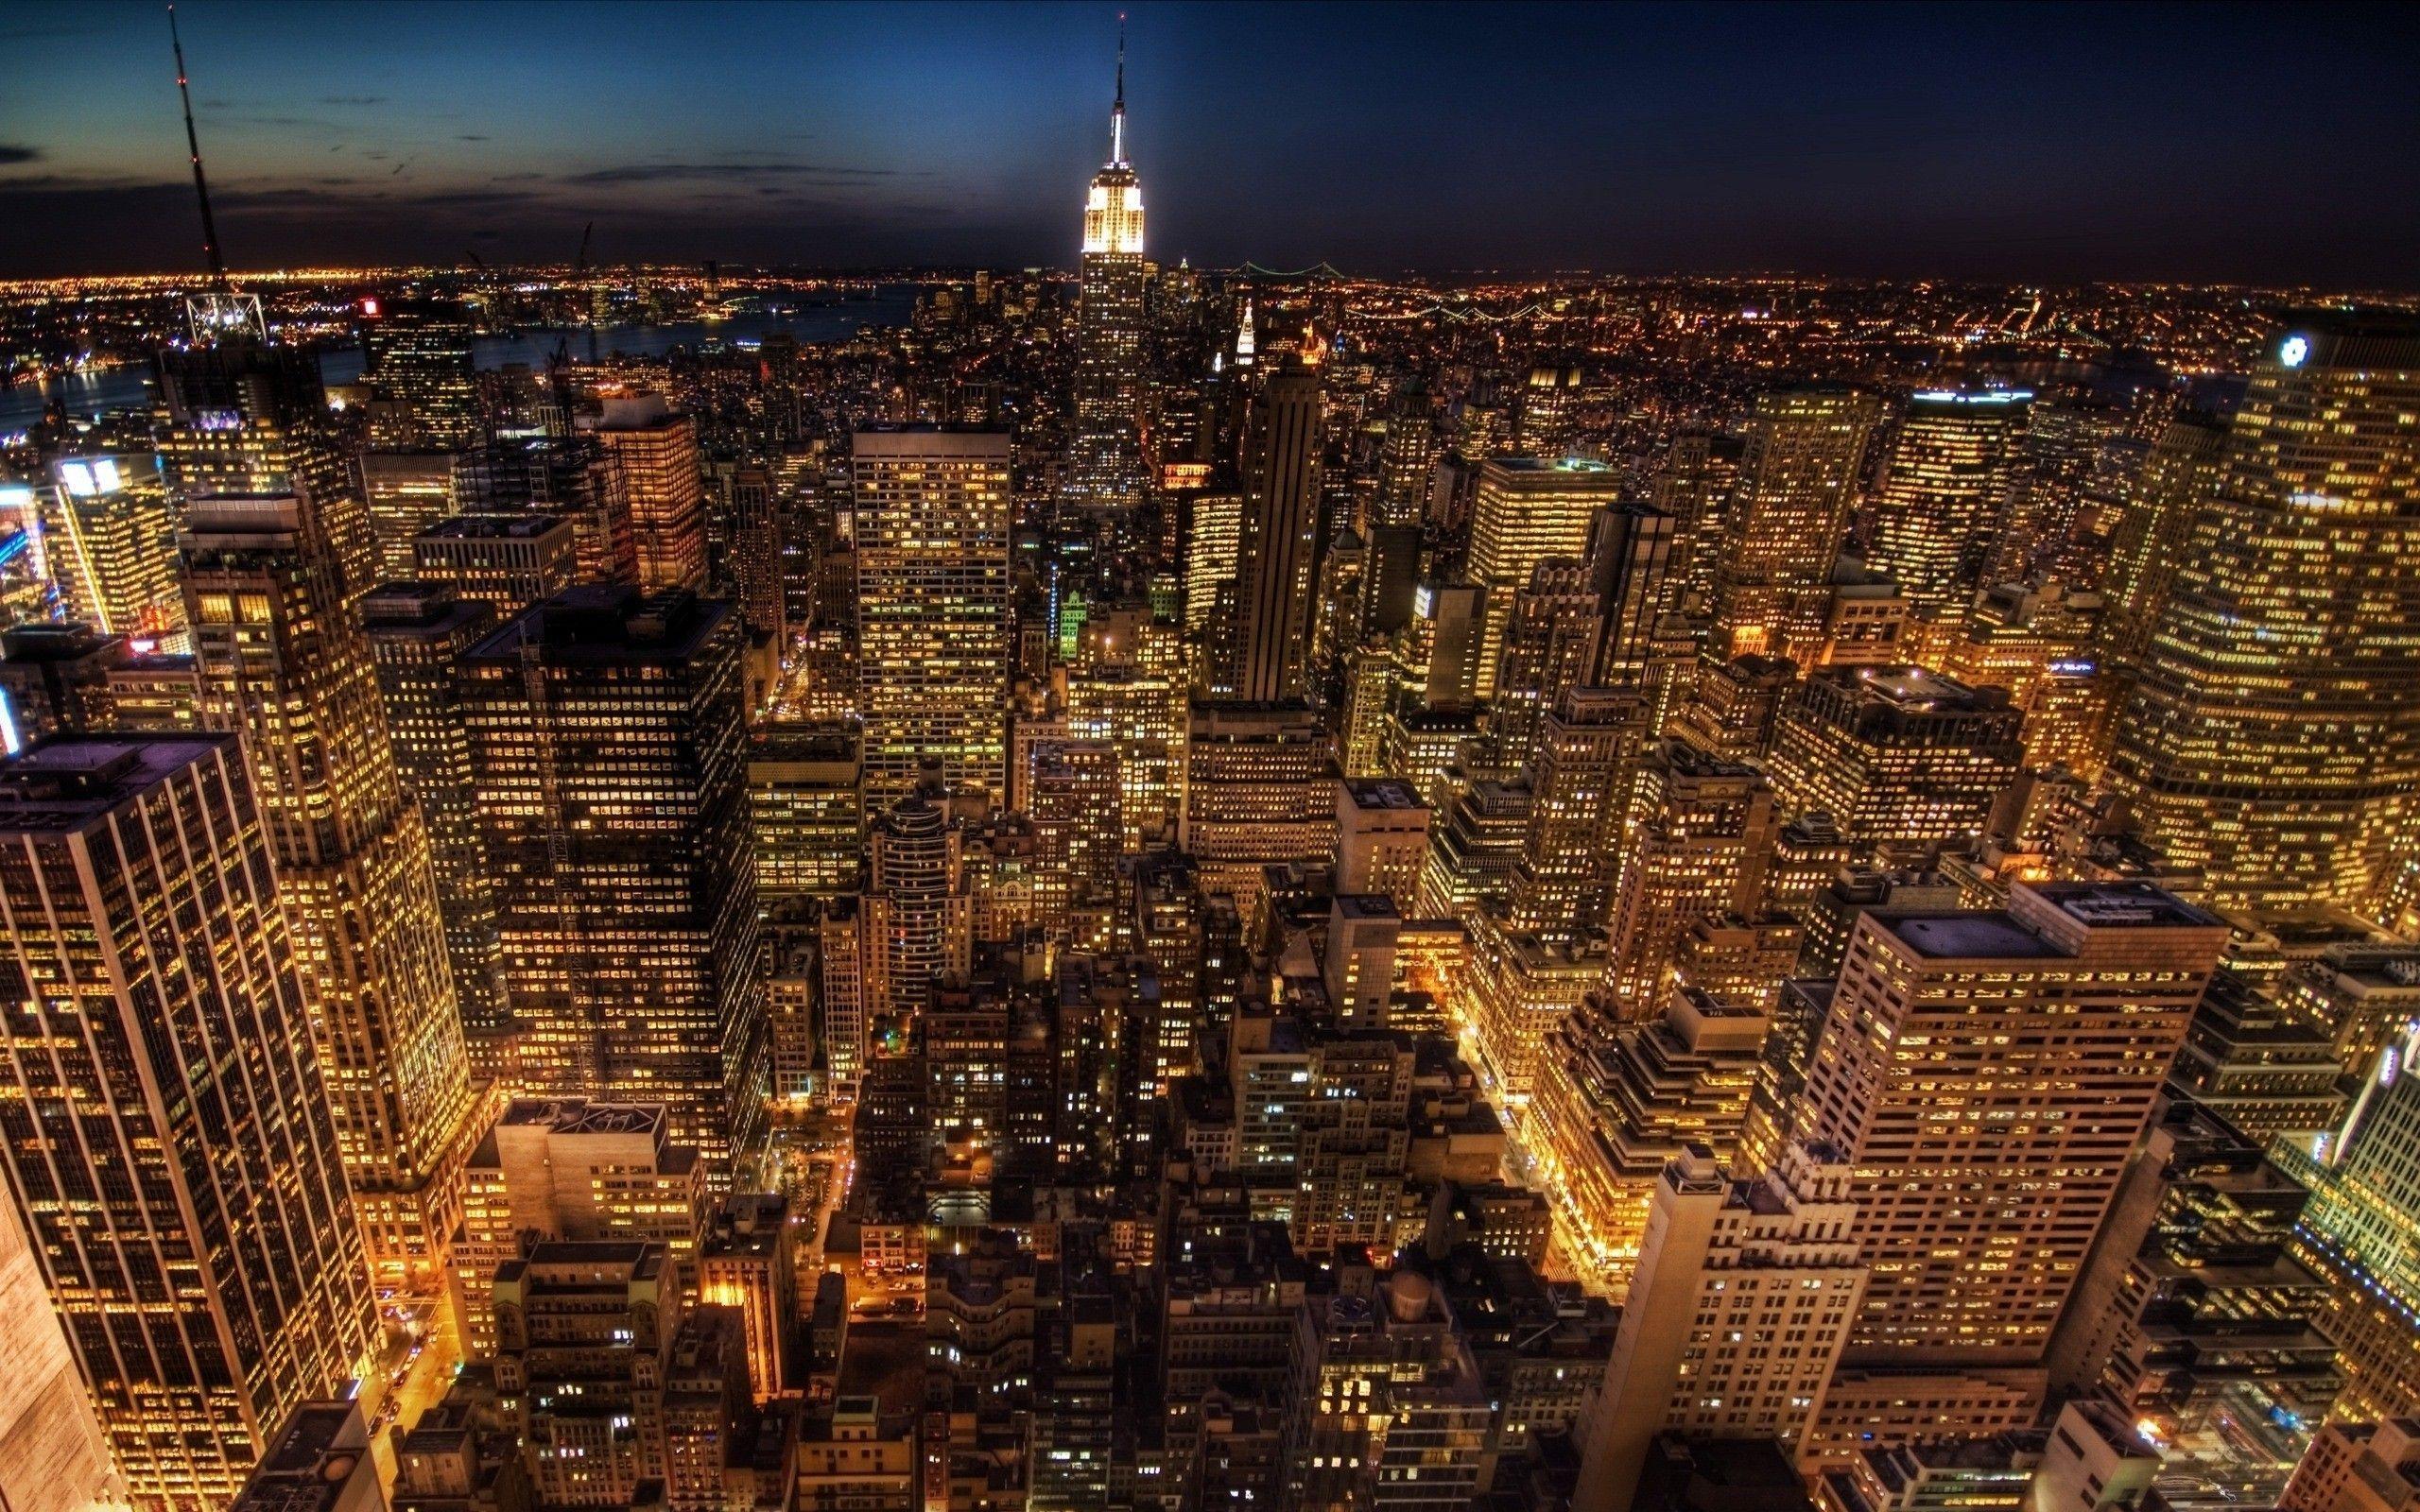 New York City Wallpaper At Night – wallpaper.